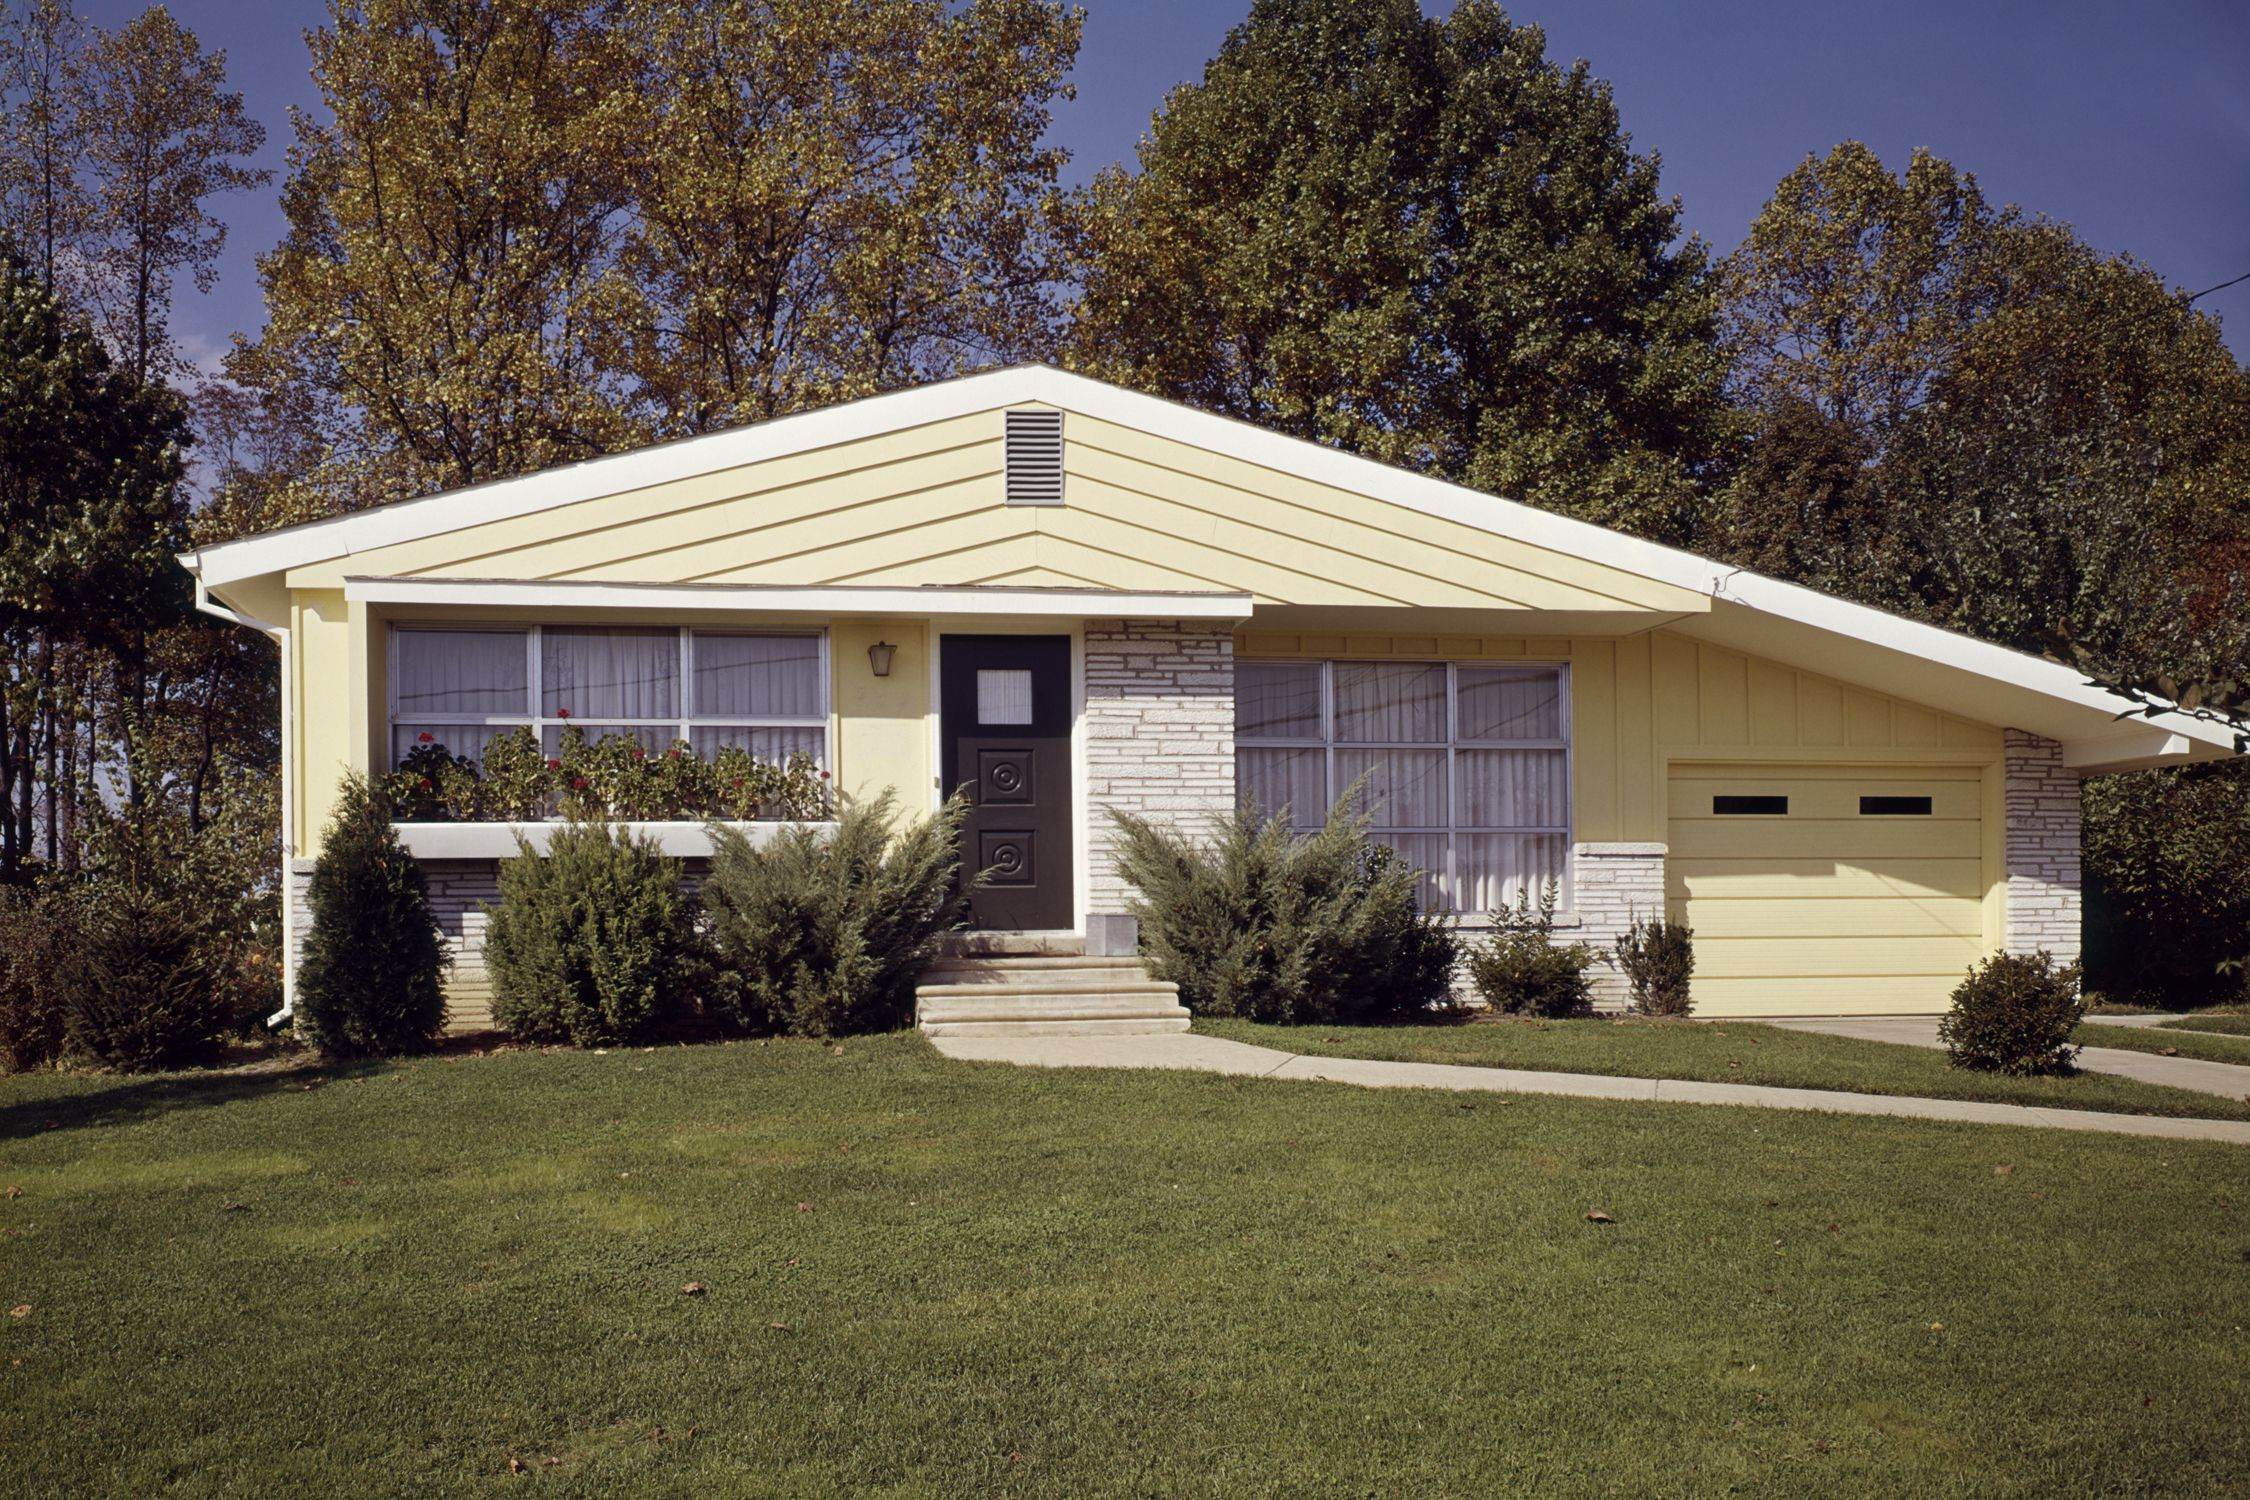 Home Exterior Trends   How Home Exterior Trends Have Evolved Through The  Decades